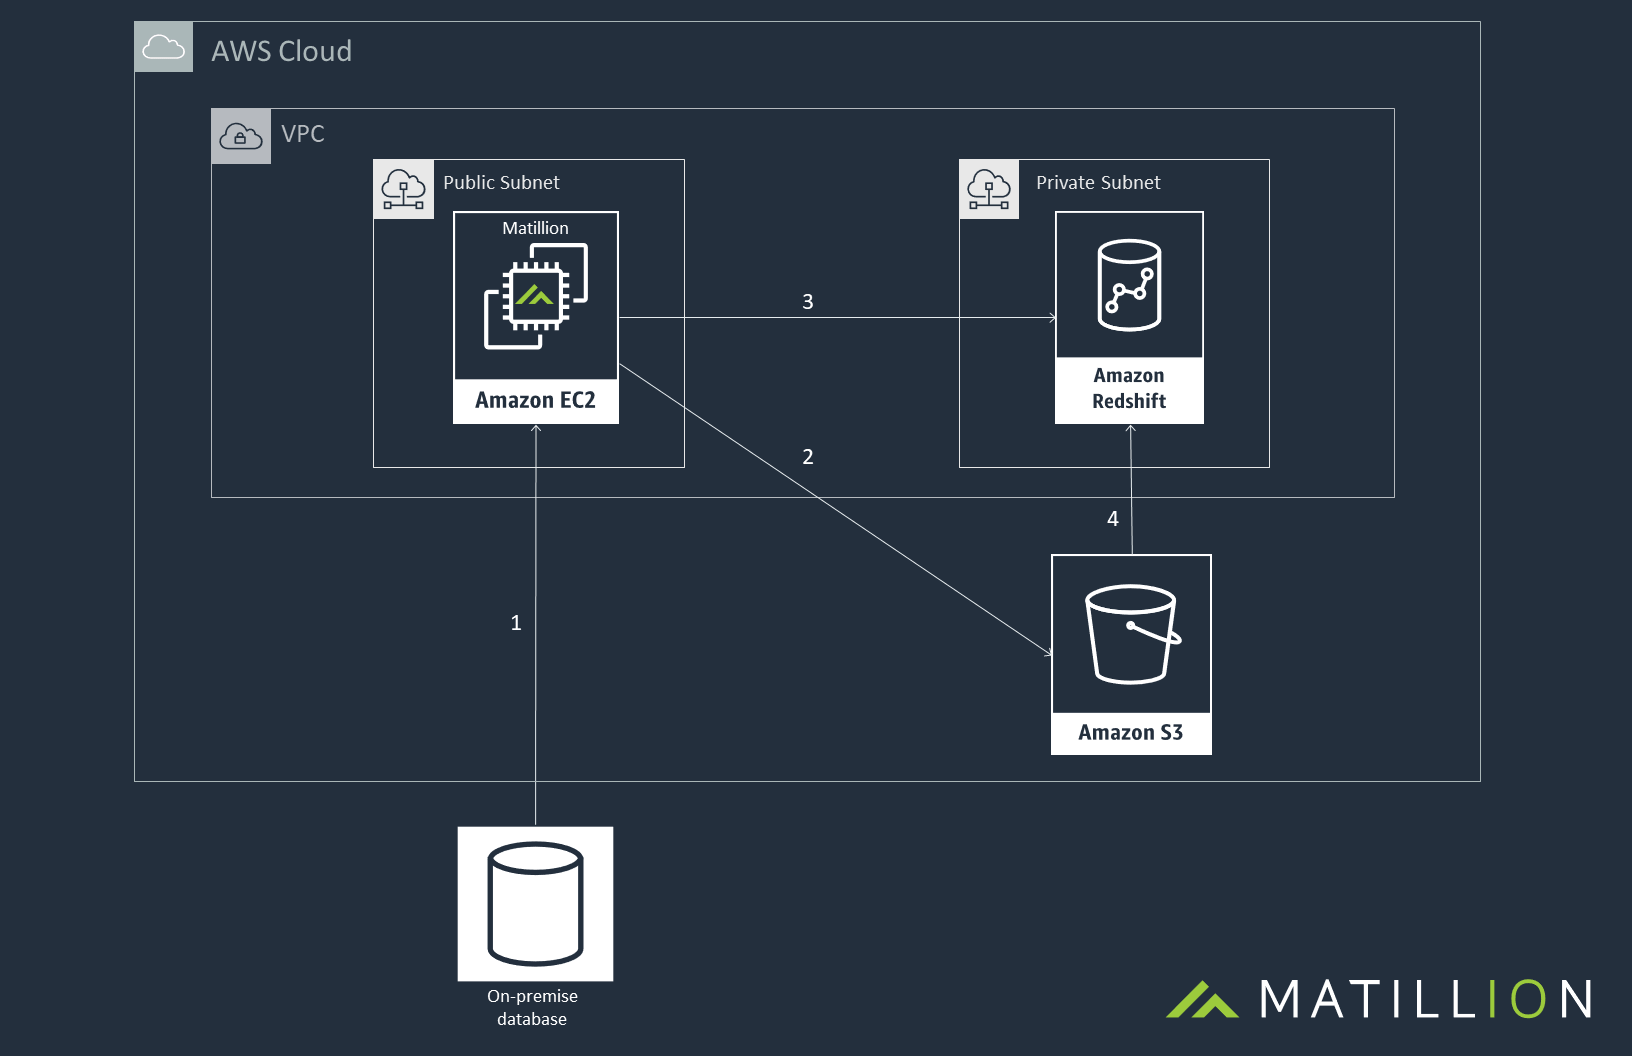 Matillion AWS Architecture Diagram - General